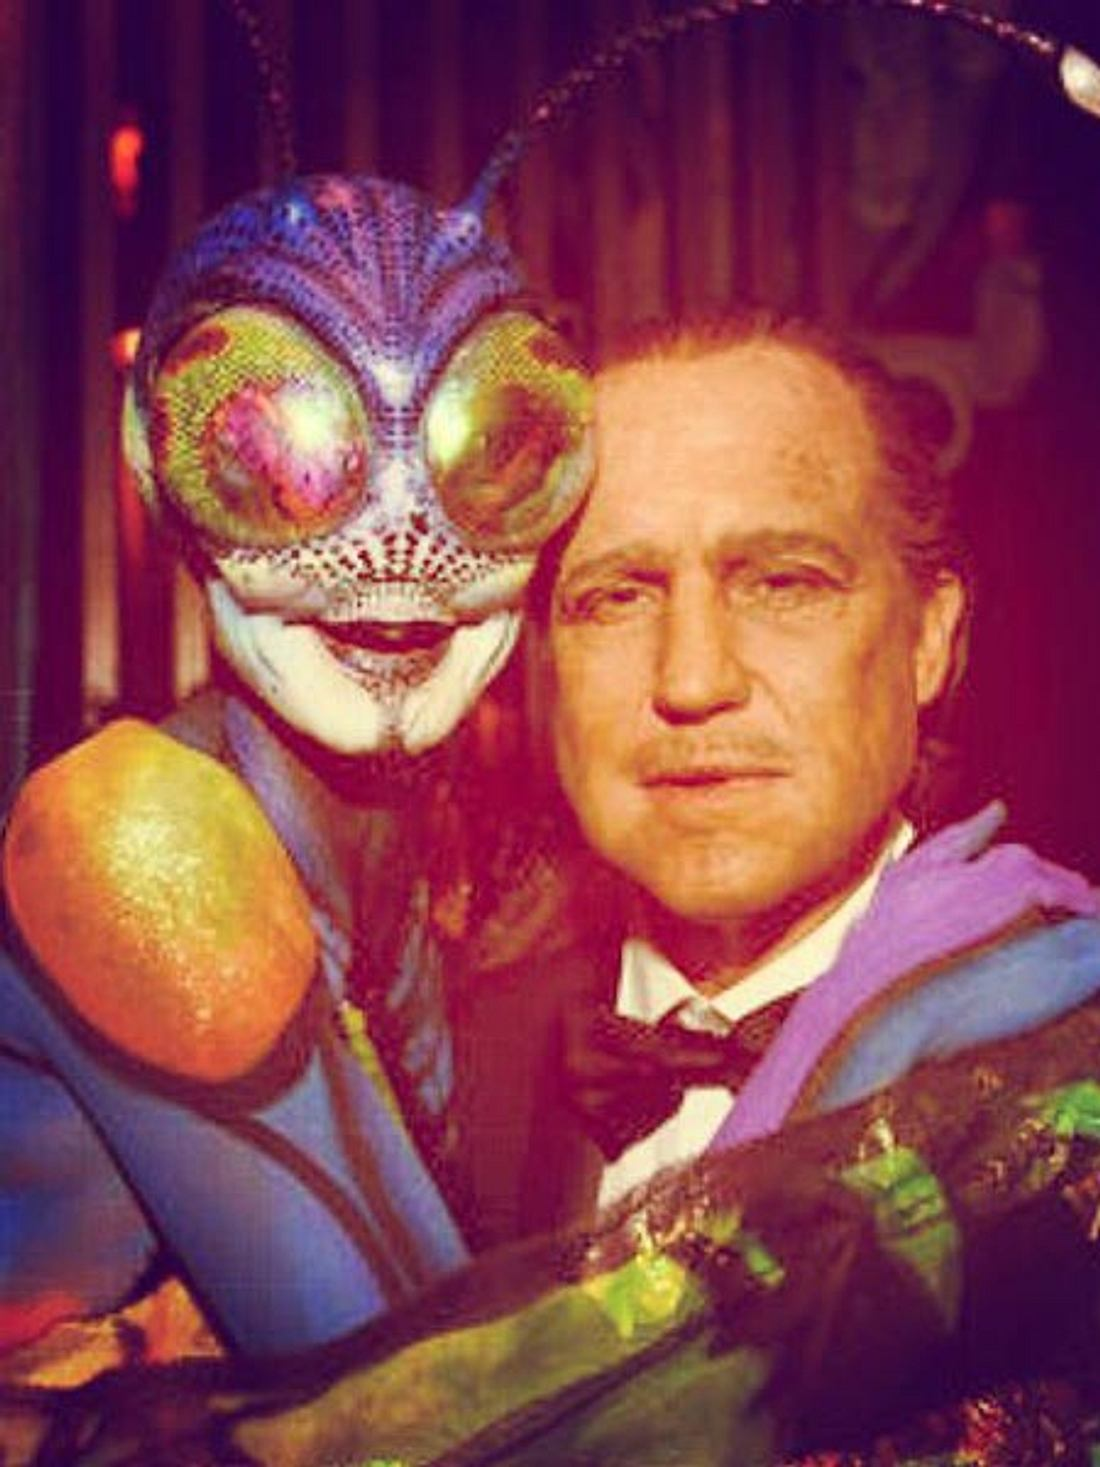 Heidi Klum feierte Halloween mit Vito Schnabel